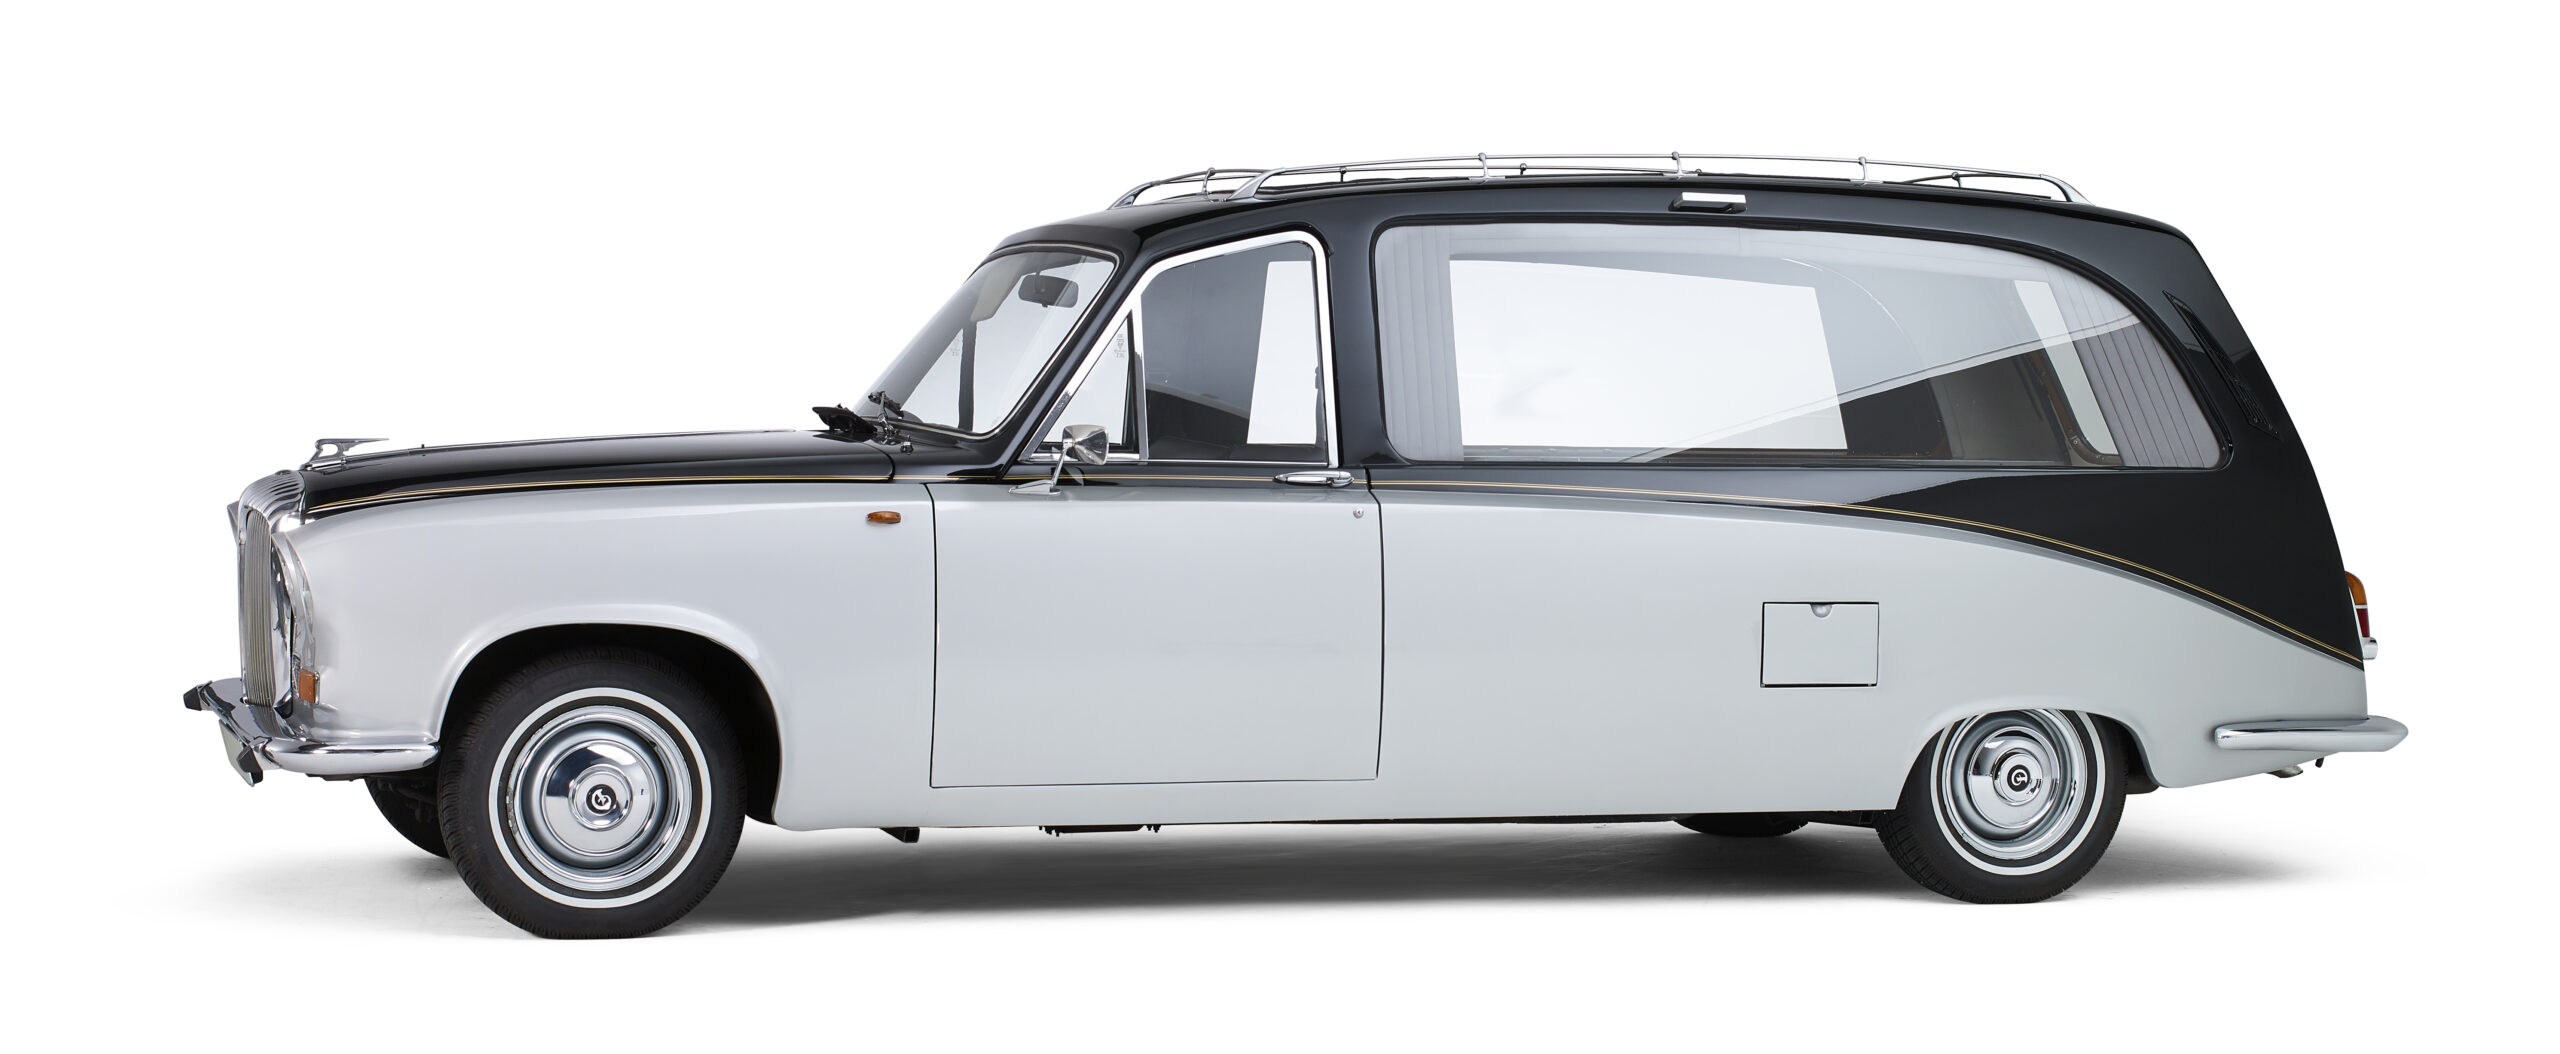 Daimler klassieke oldtimer rouwauto